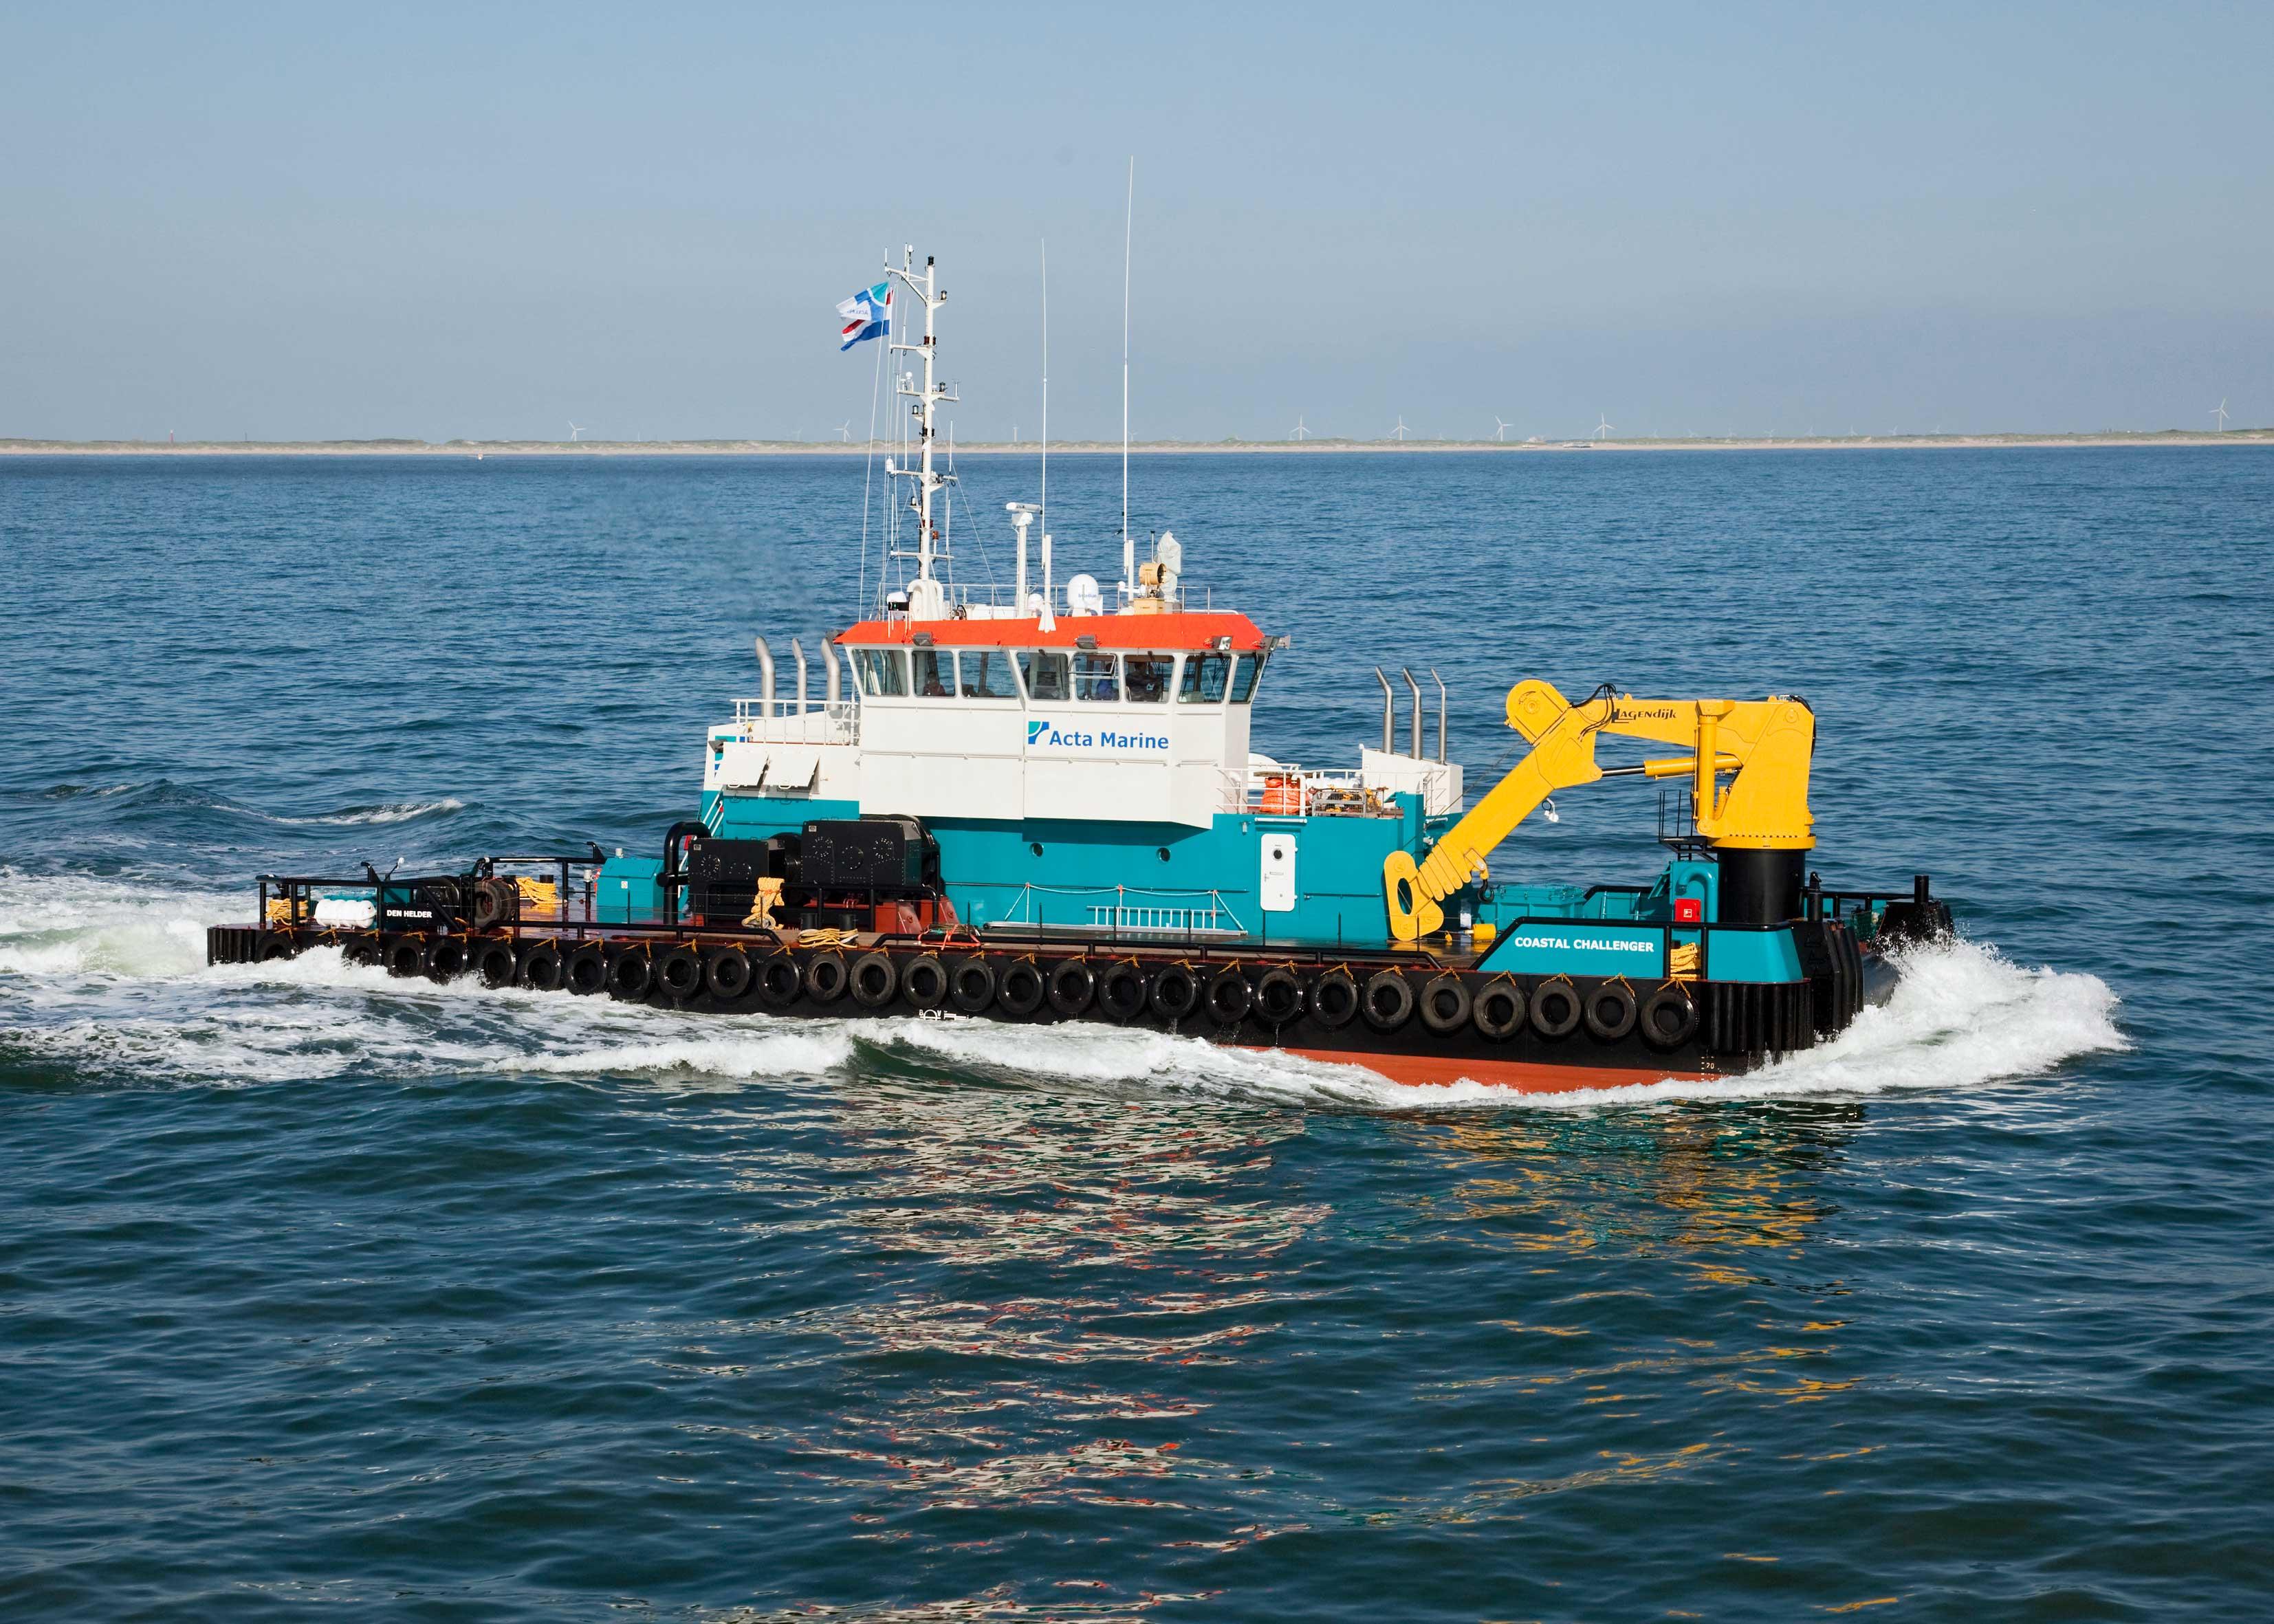 Vessel Coastal Challenger for Acta Marine